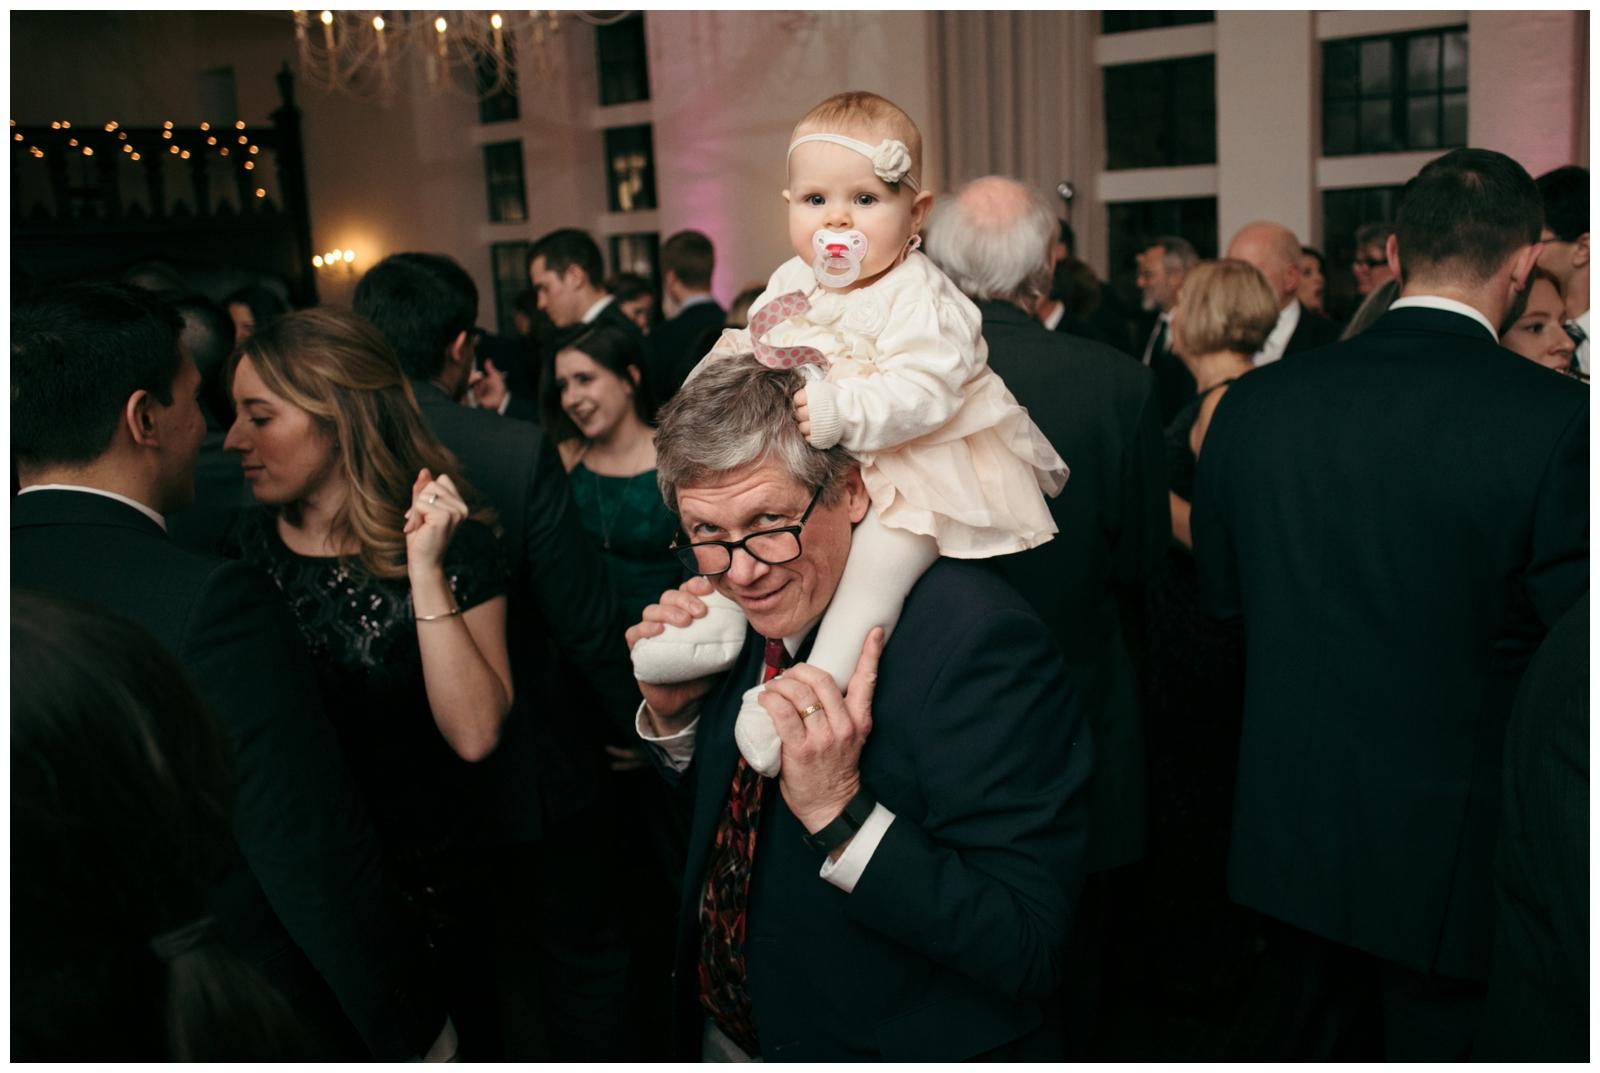 Alden-Castle-Wedding-Boston-Bailey-Q-Photo-064.jpg